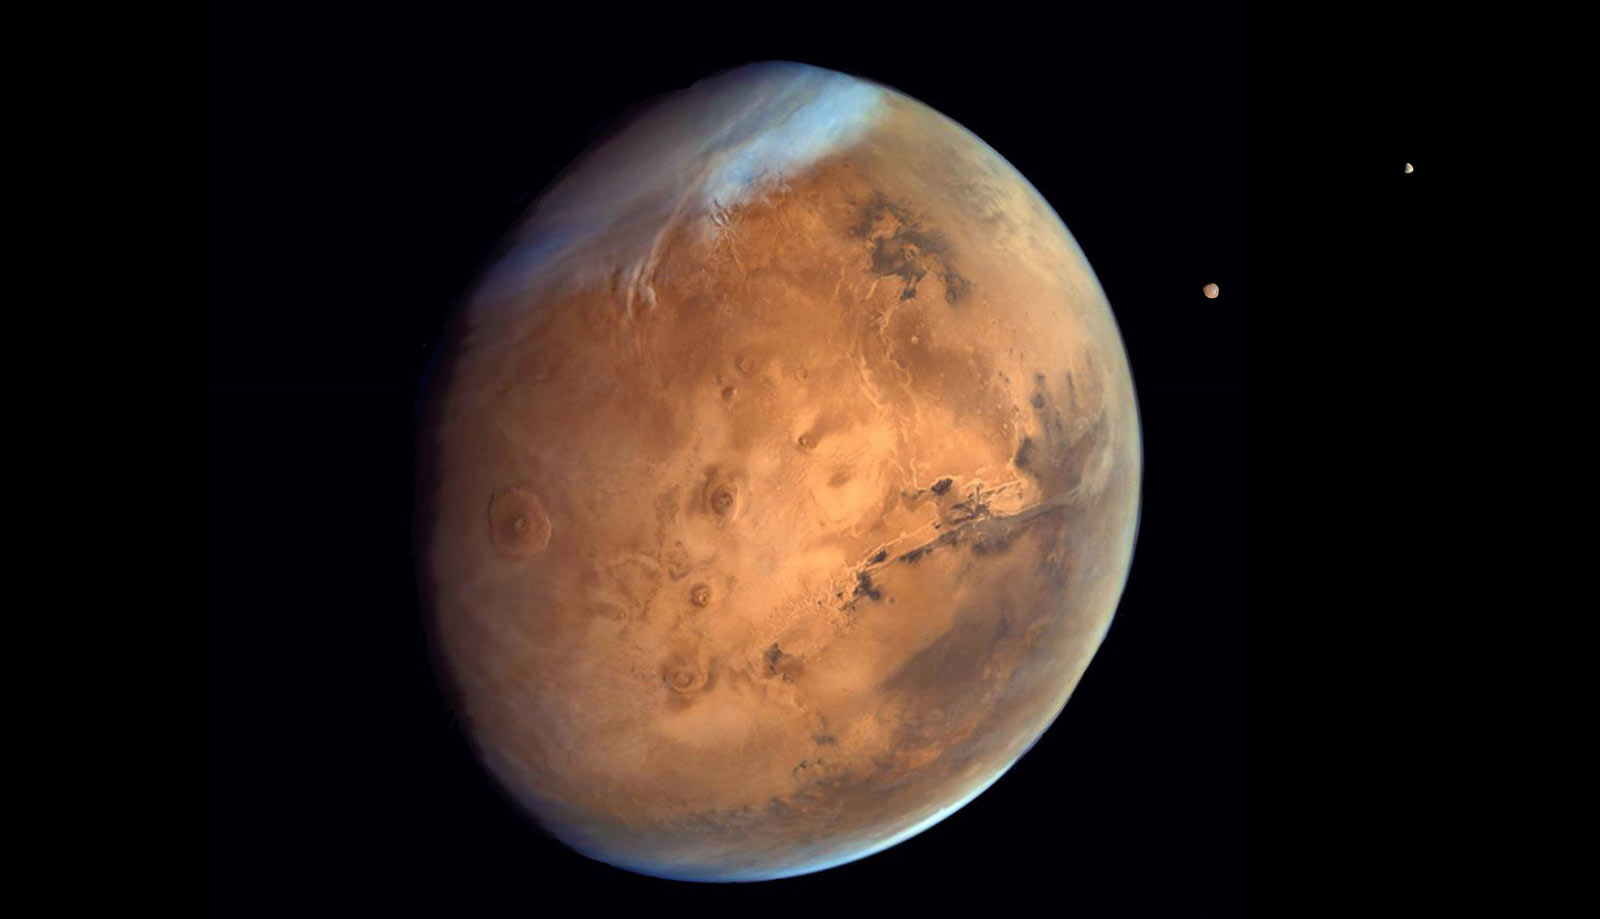 mars planet 2moons - photo #33